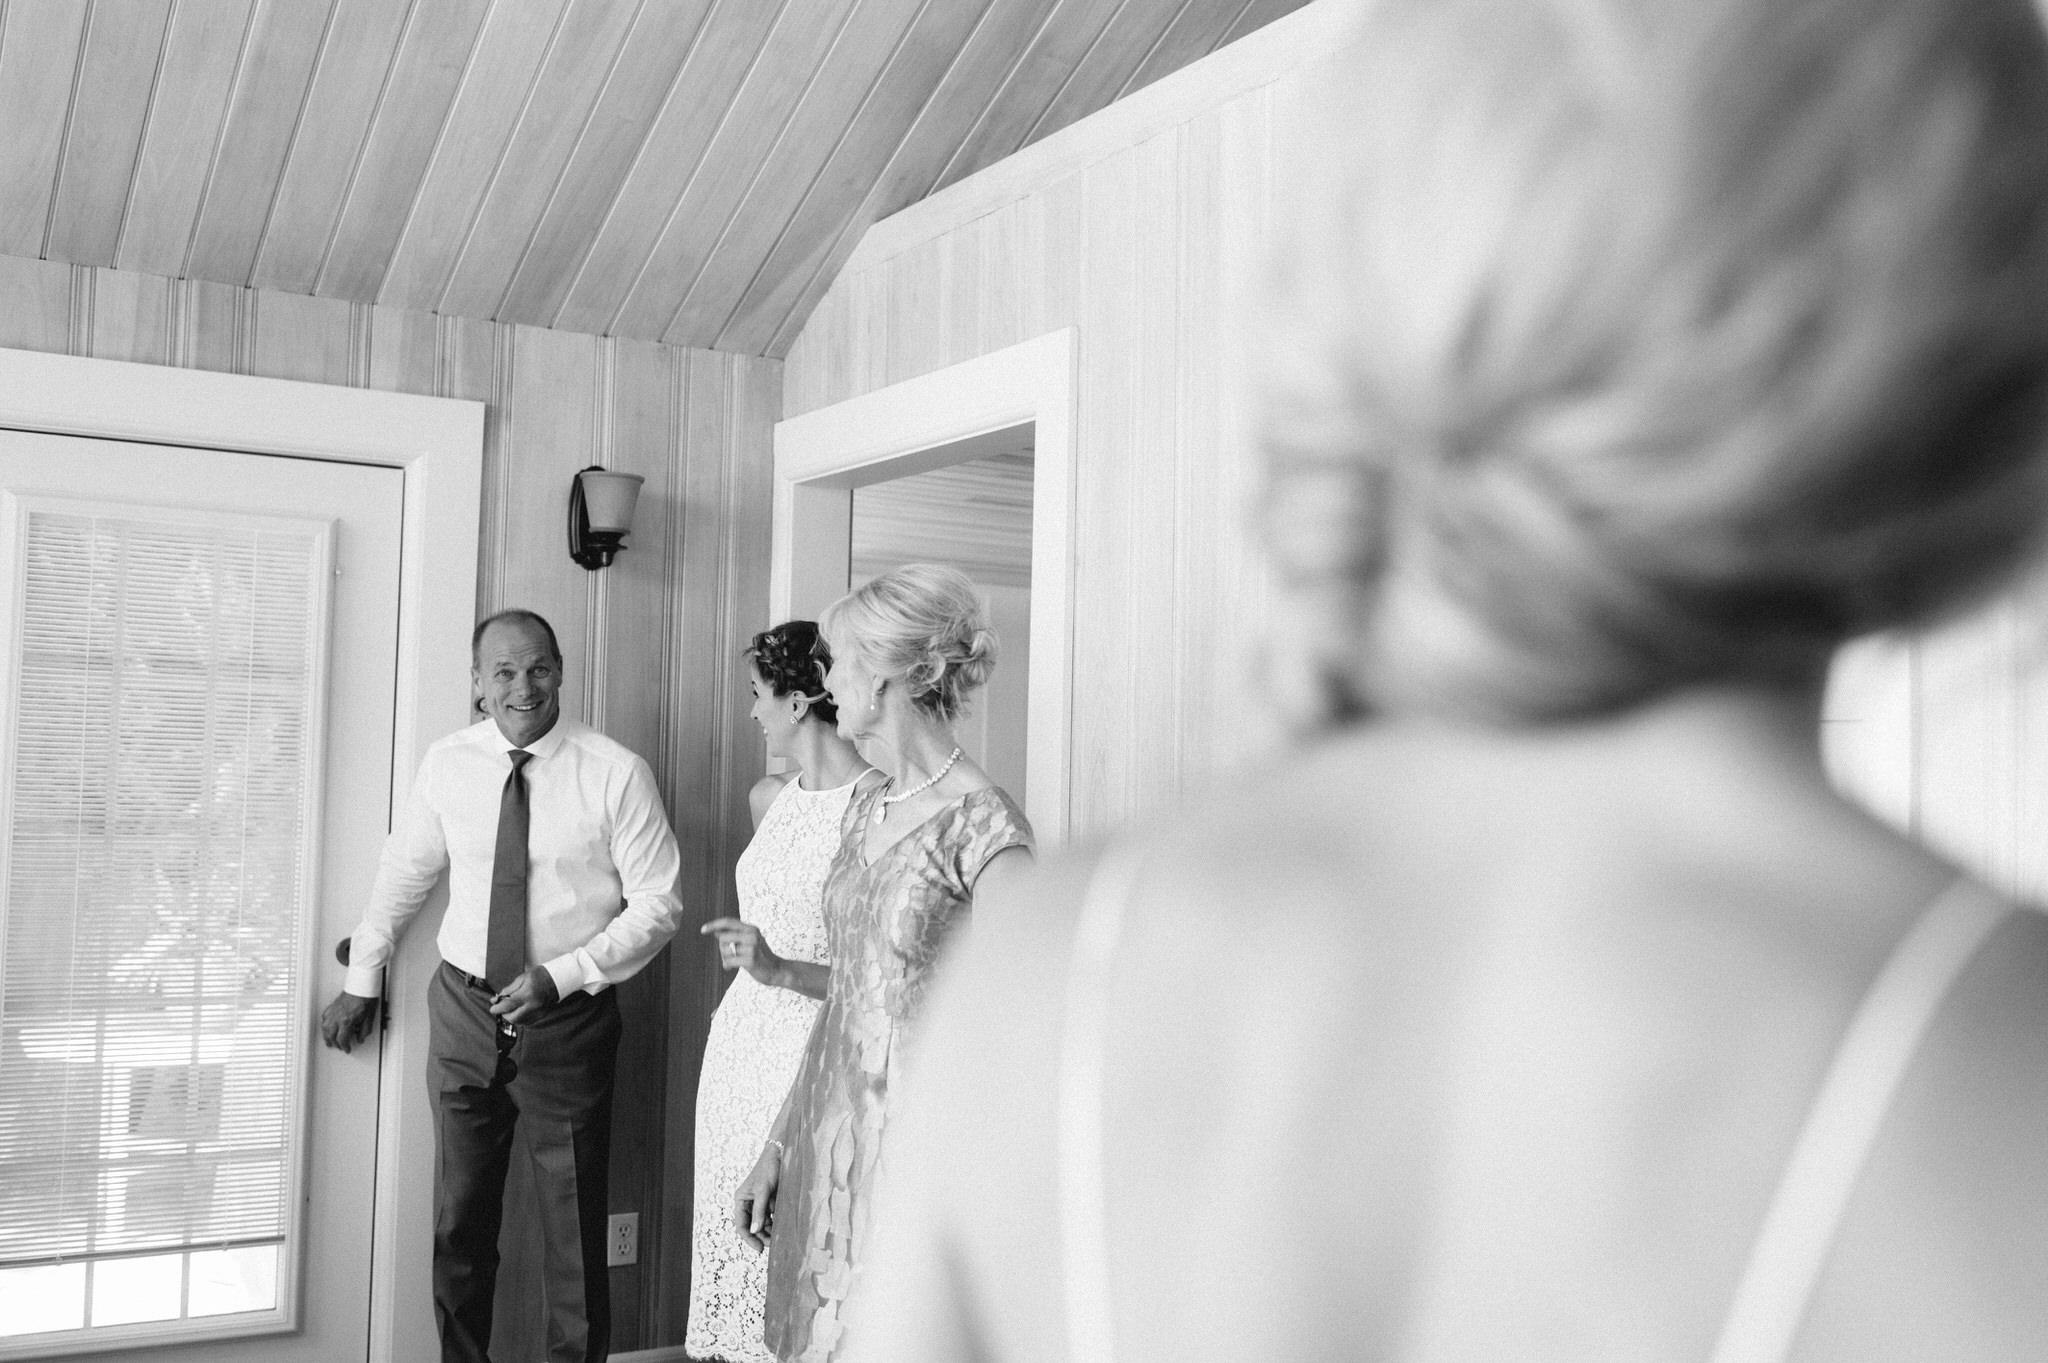 toronto wedding photography scarlet oneill031.JPG